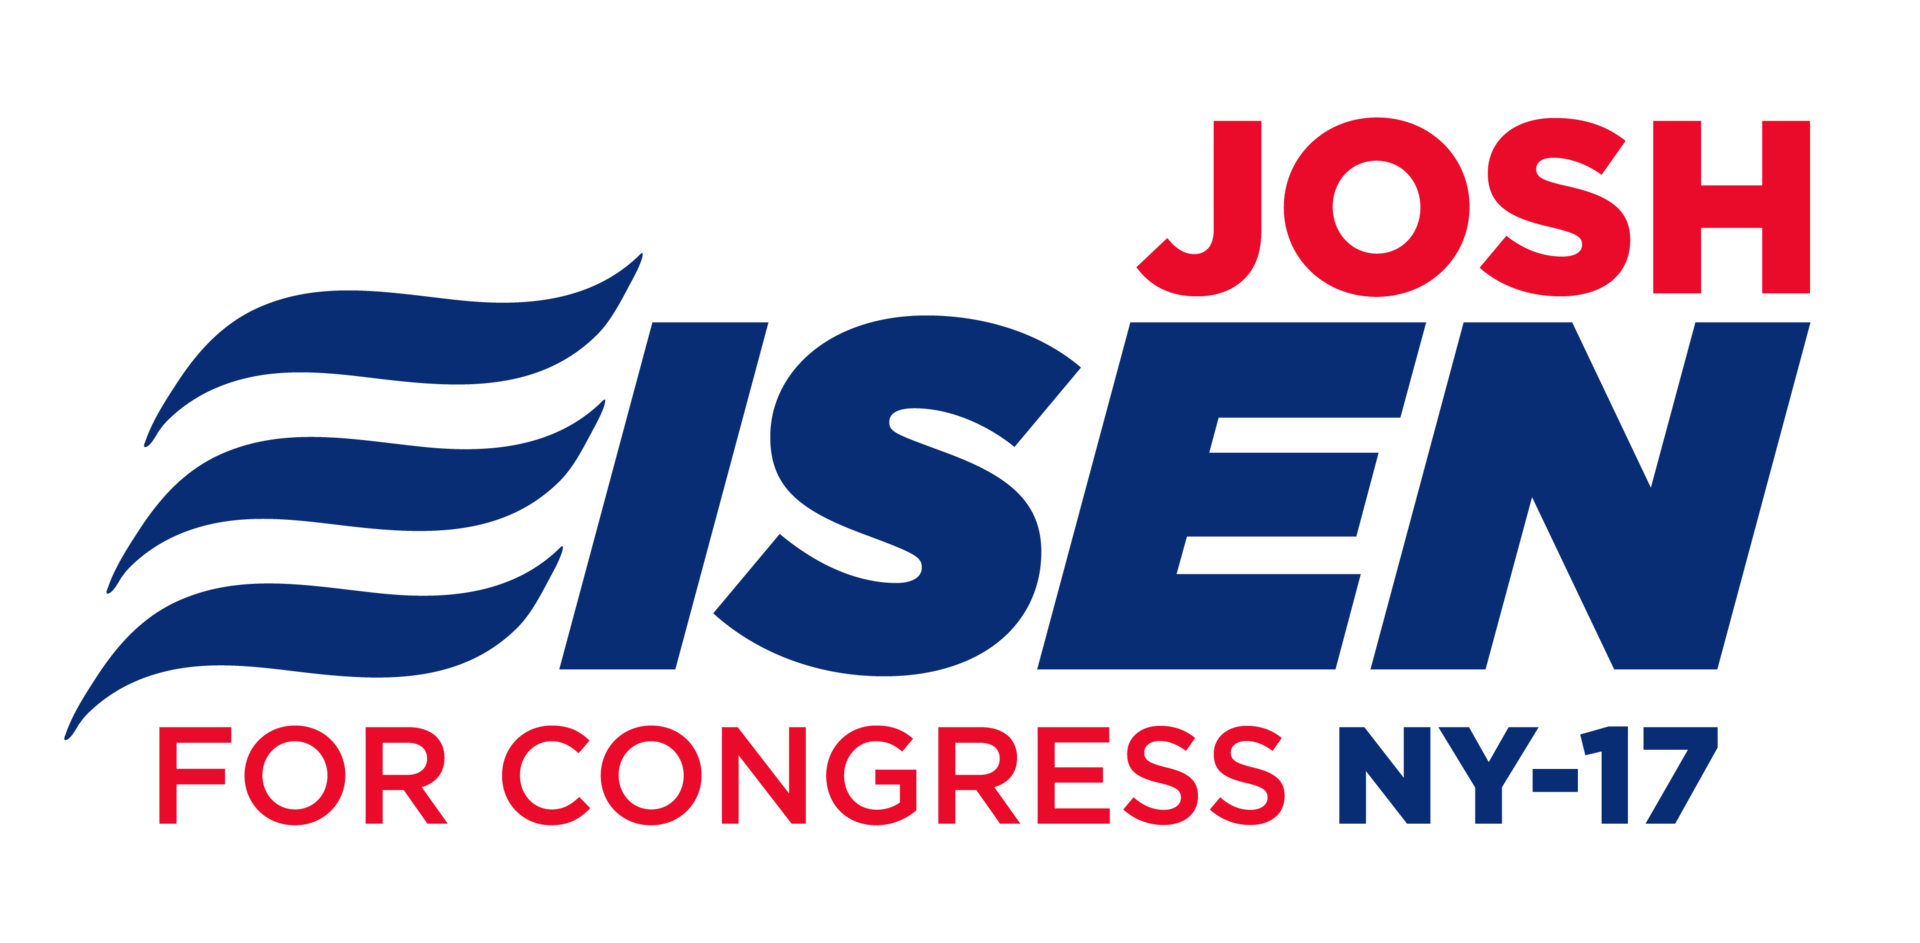 Josh eisen logo